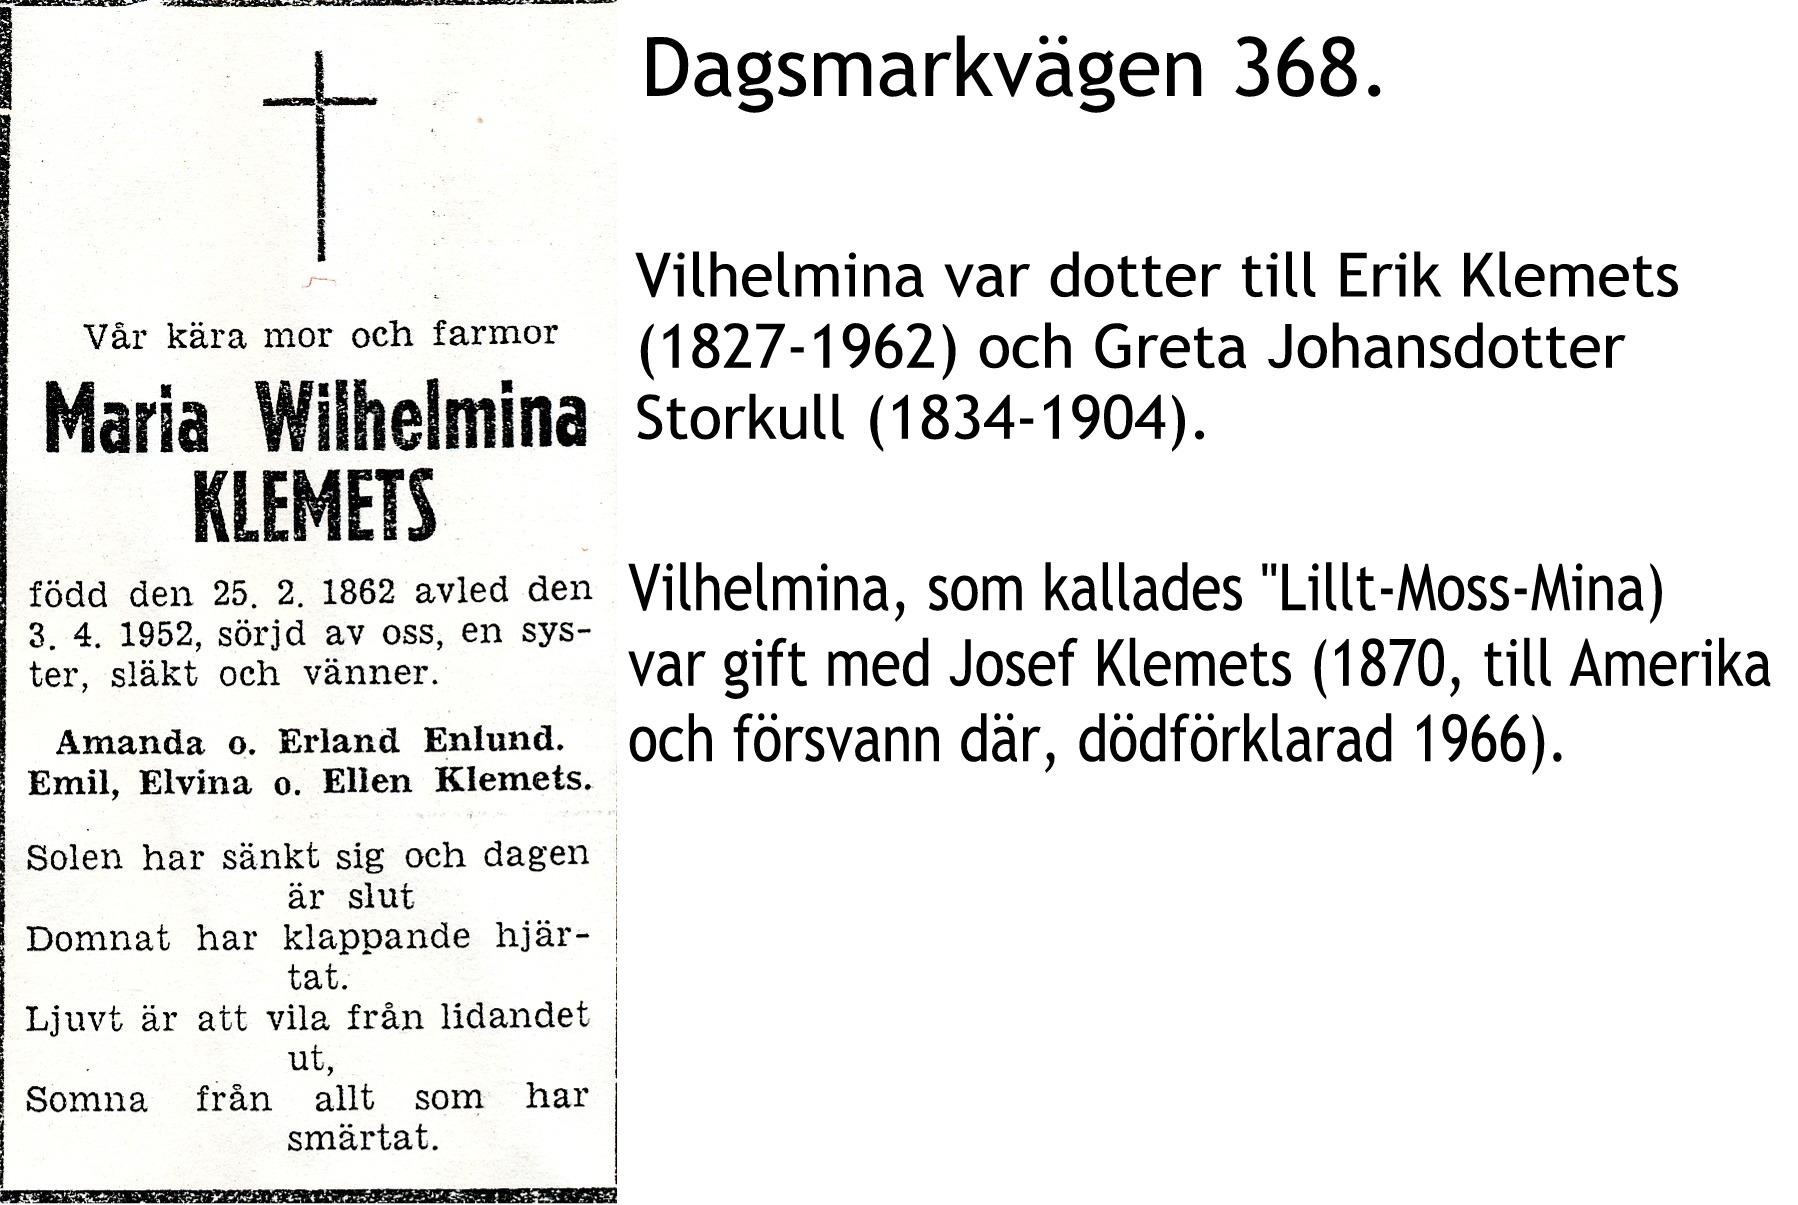 Klemets Maria Wilhelmina